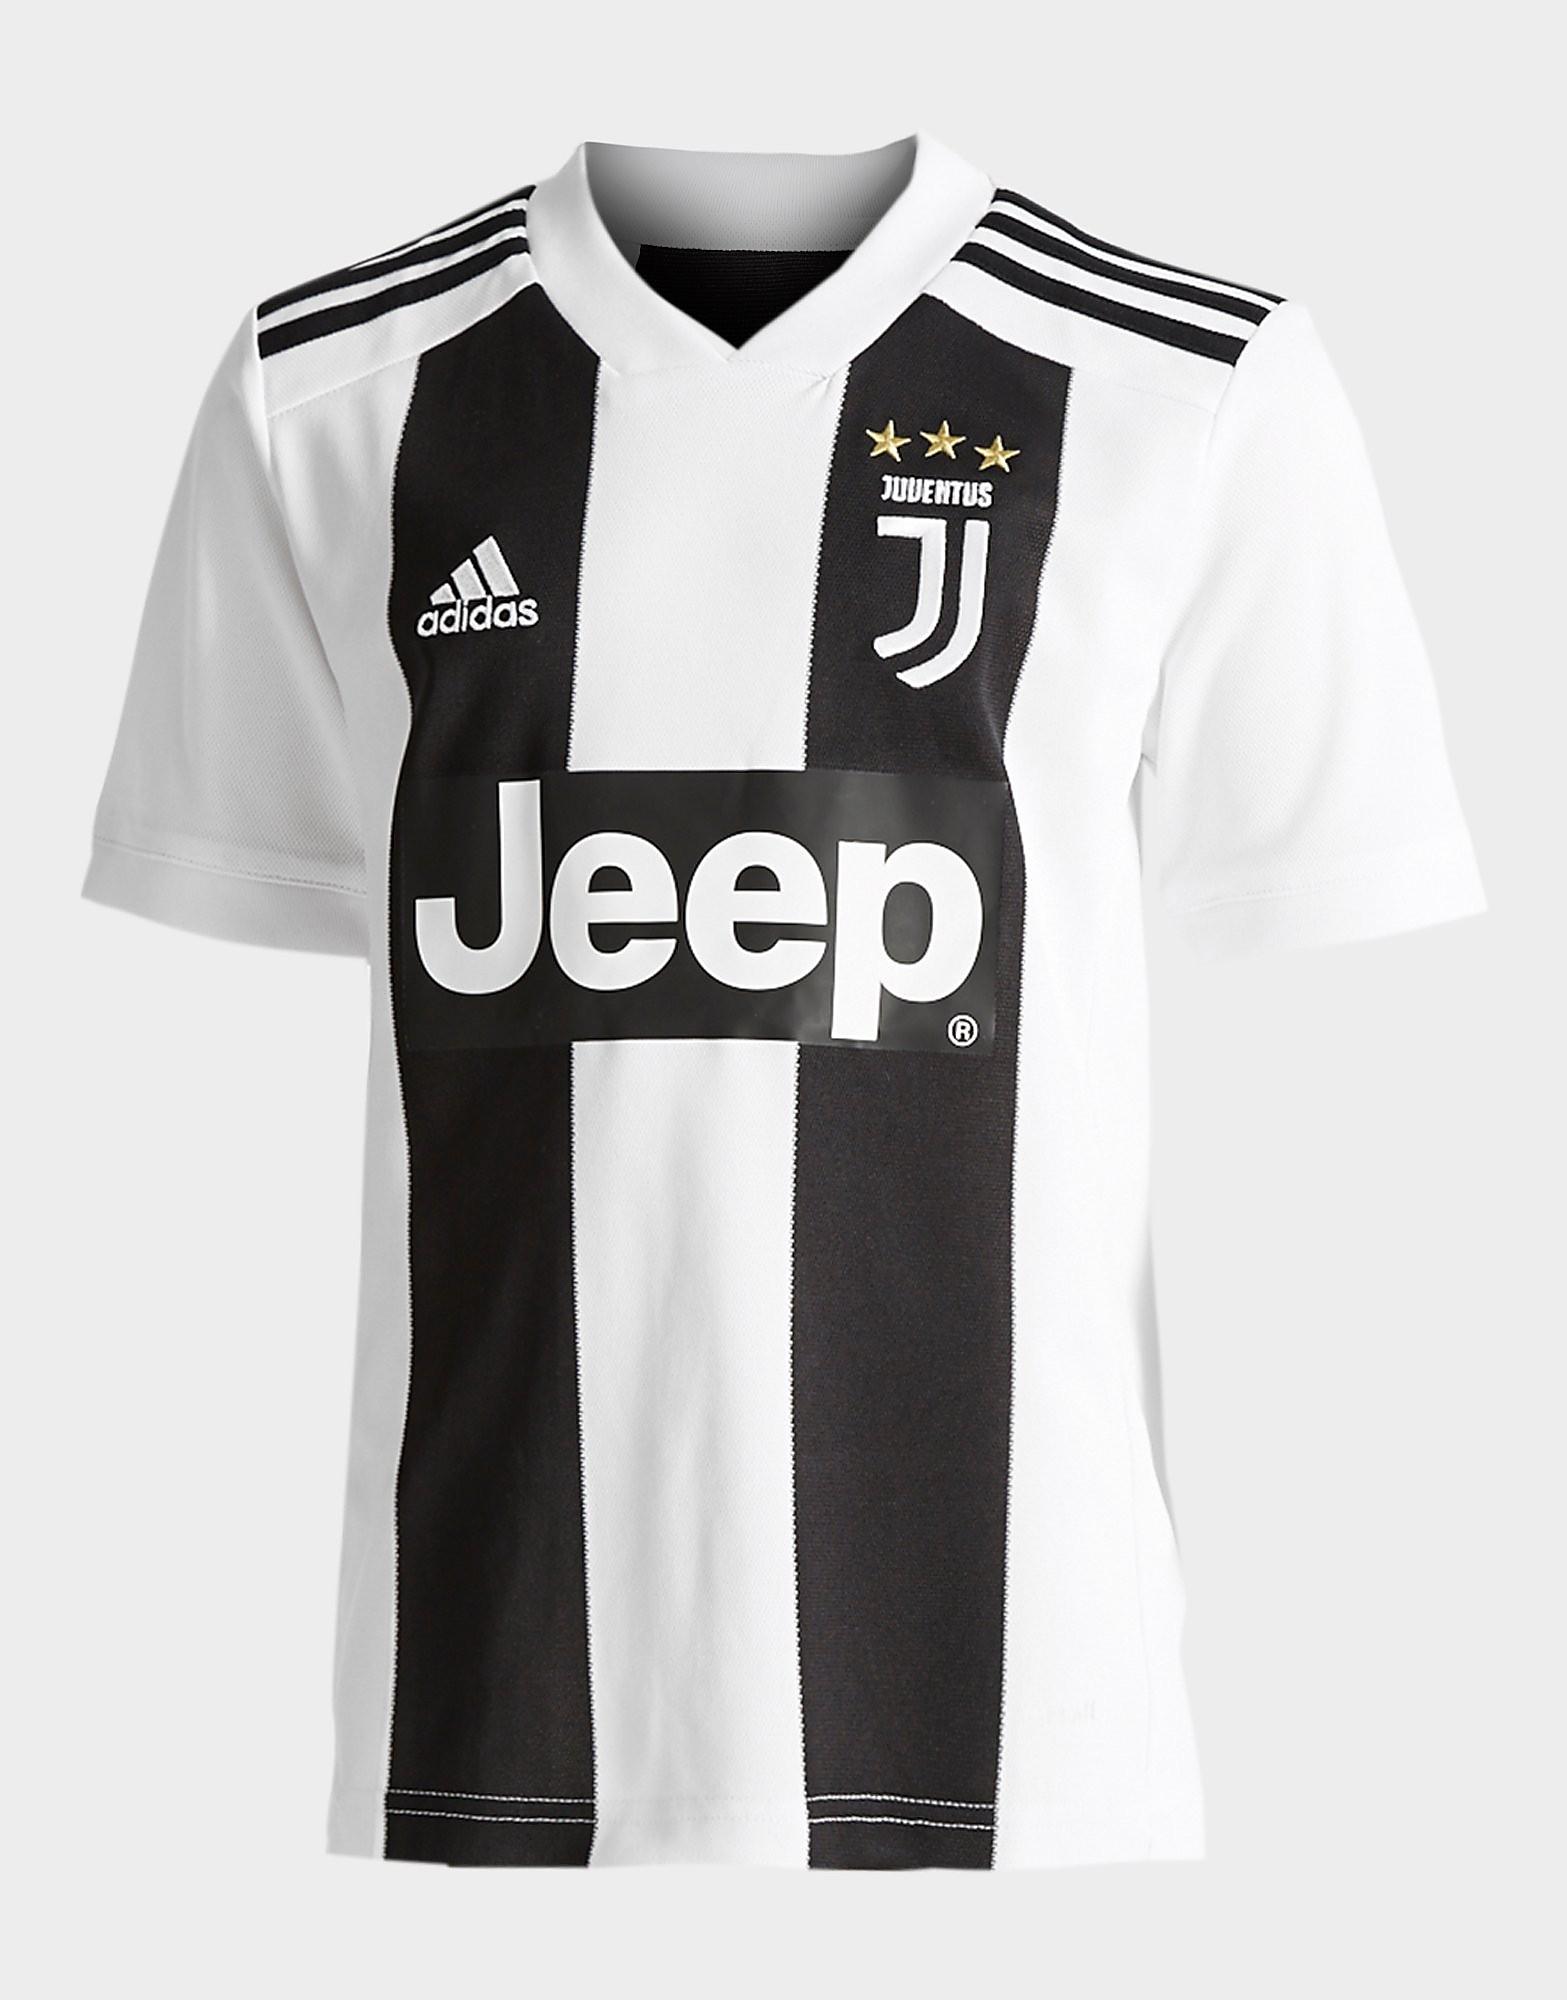 adidas Juventus 2018/19 Home Shirt Junior PRE ORDER